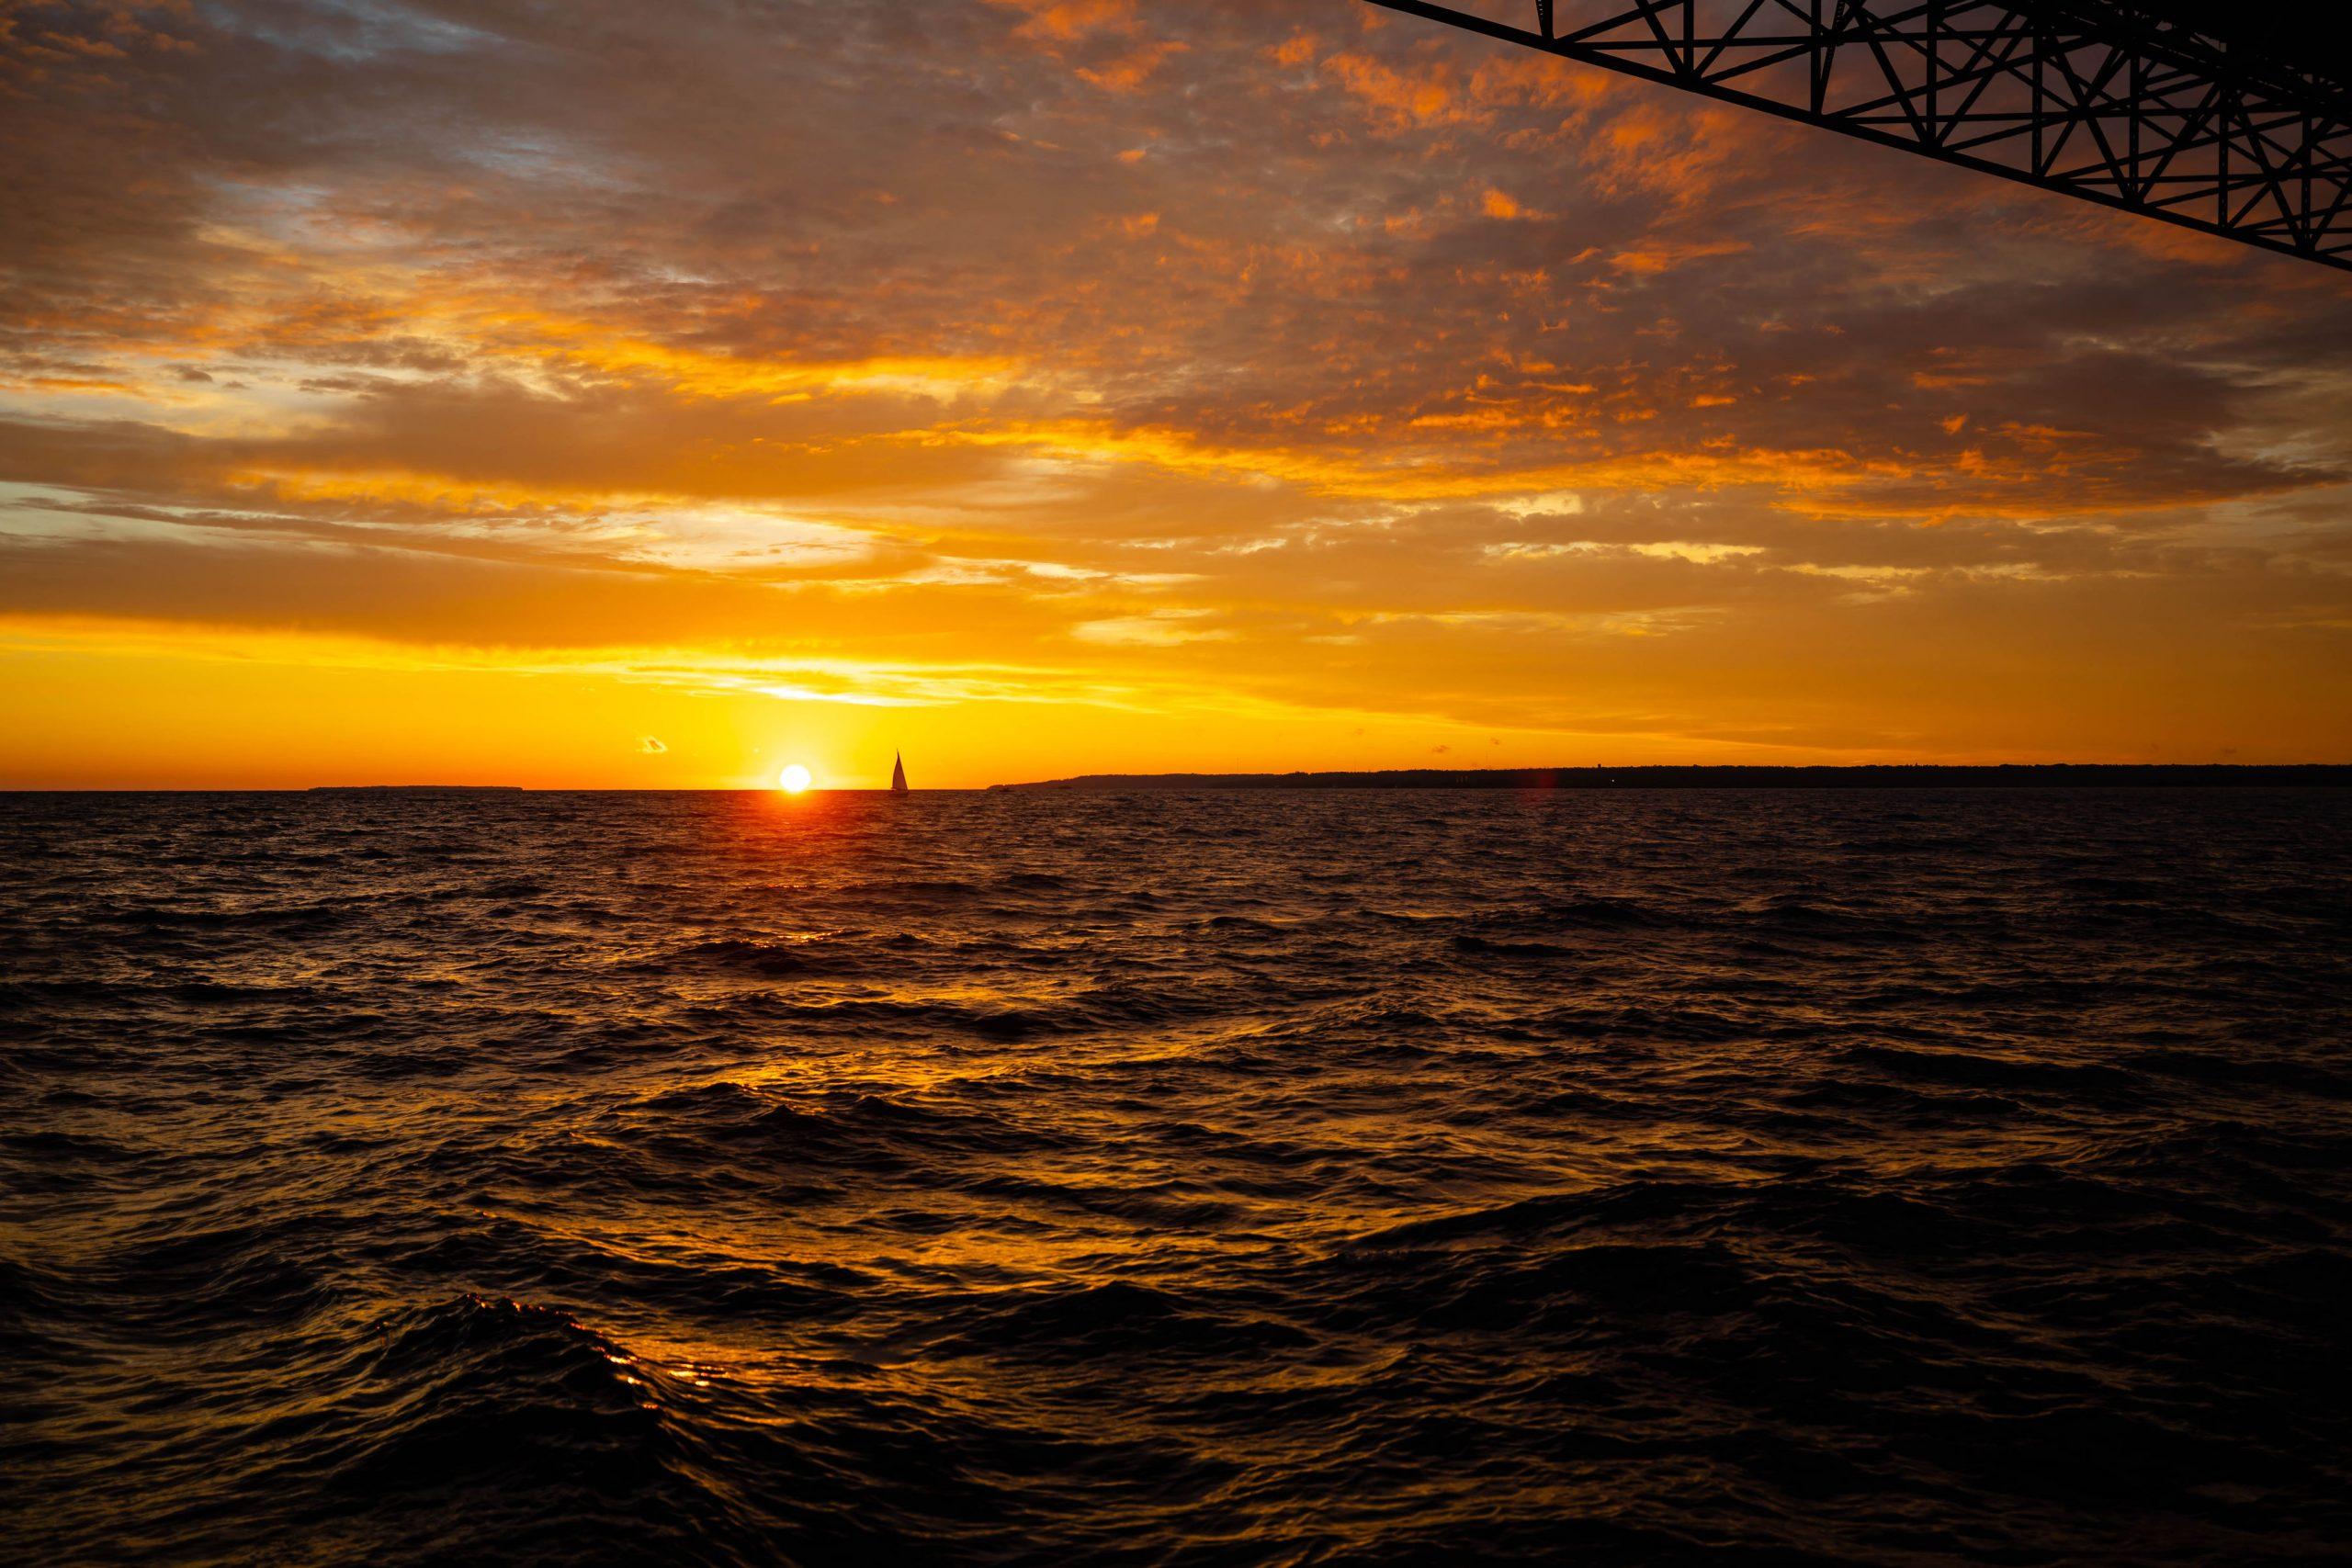 Mackinac Bridge Sailboat Sailing the Straits of Mackinac at Sunset Pure Michigan Up North by Annie Fairfax